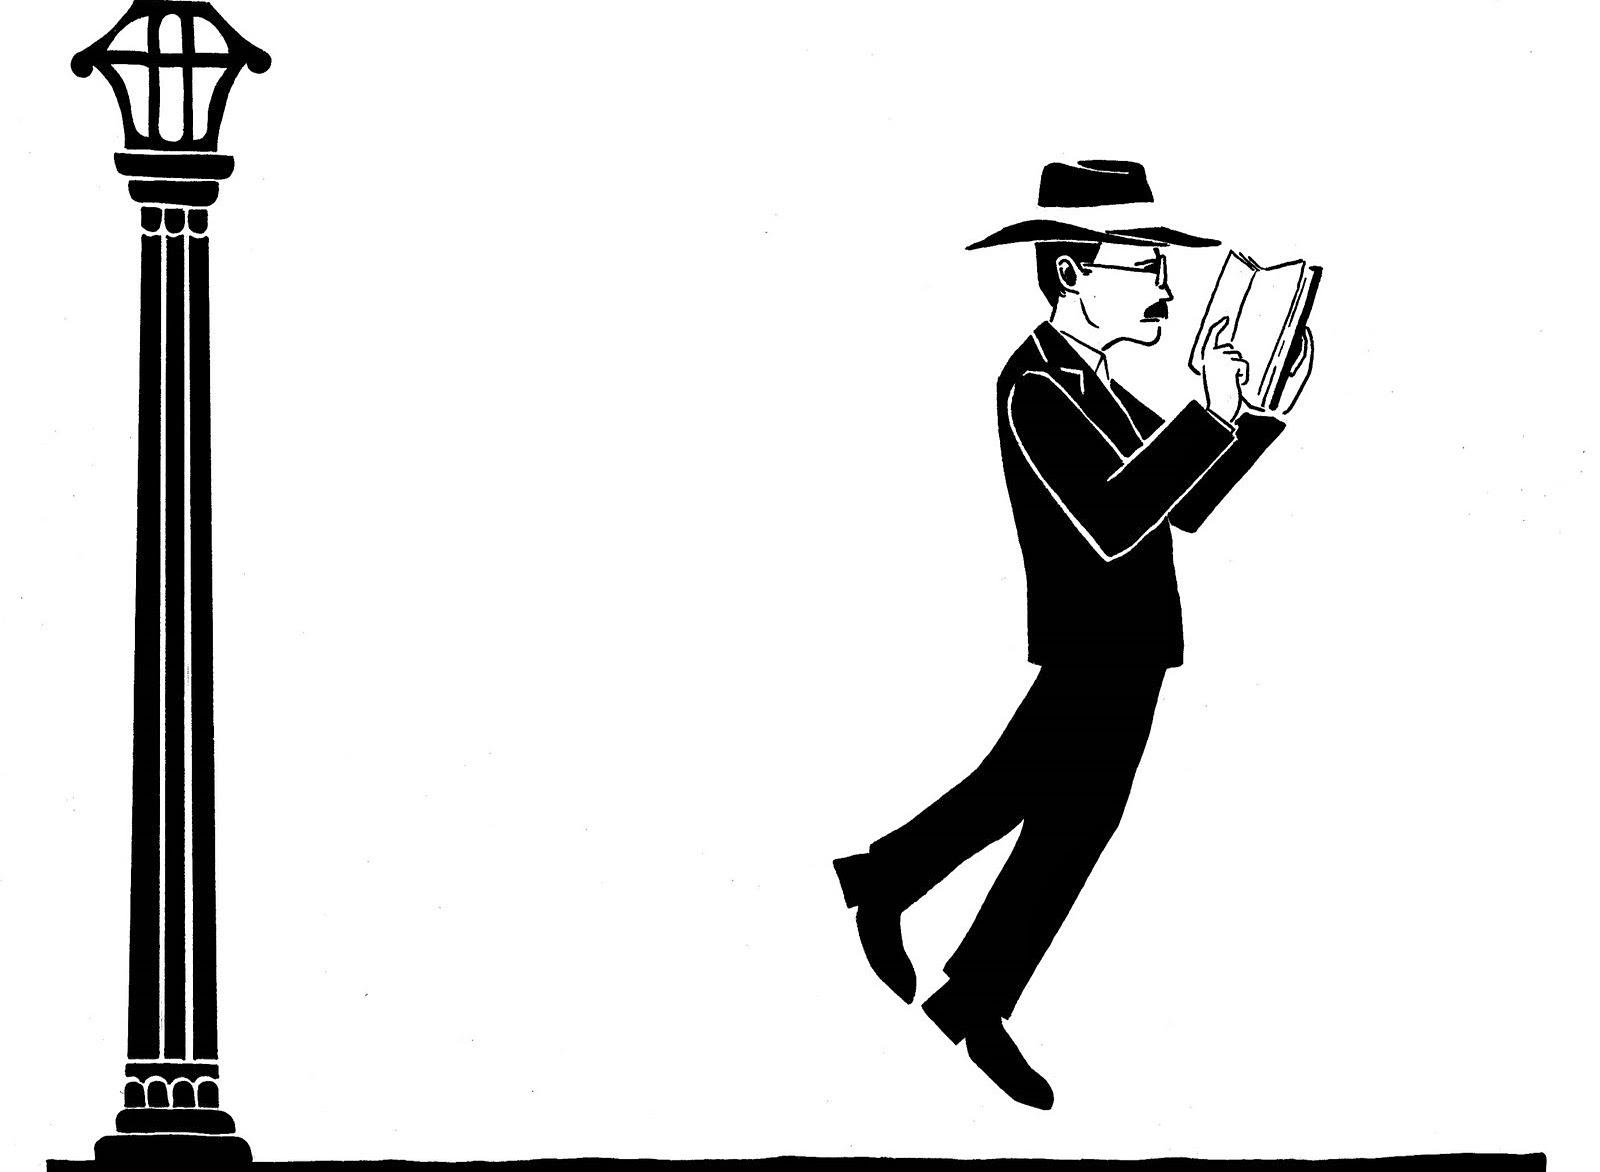 50 Frases Clássicas De Escritores Célebres Ncultura